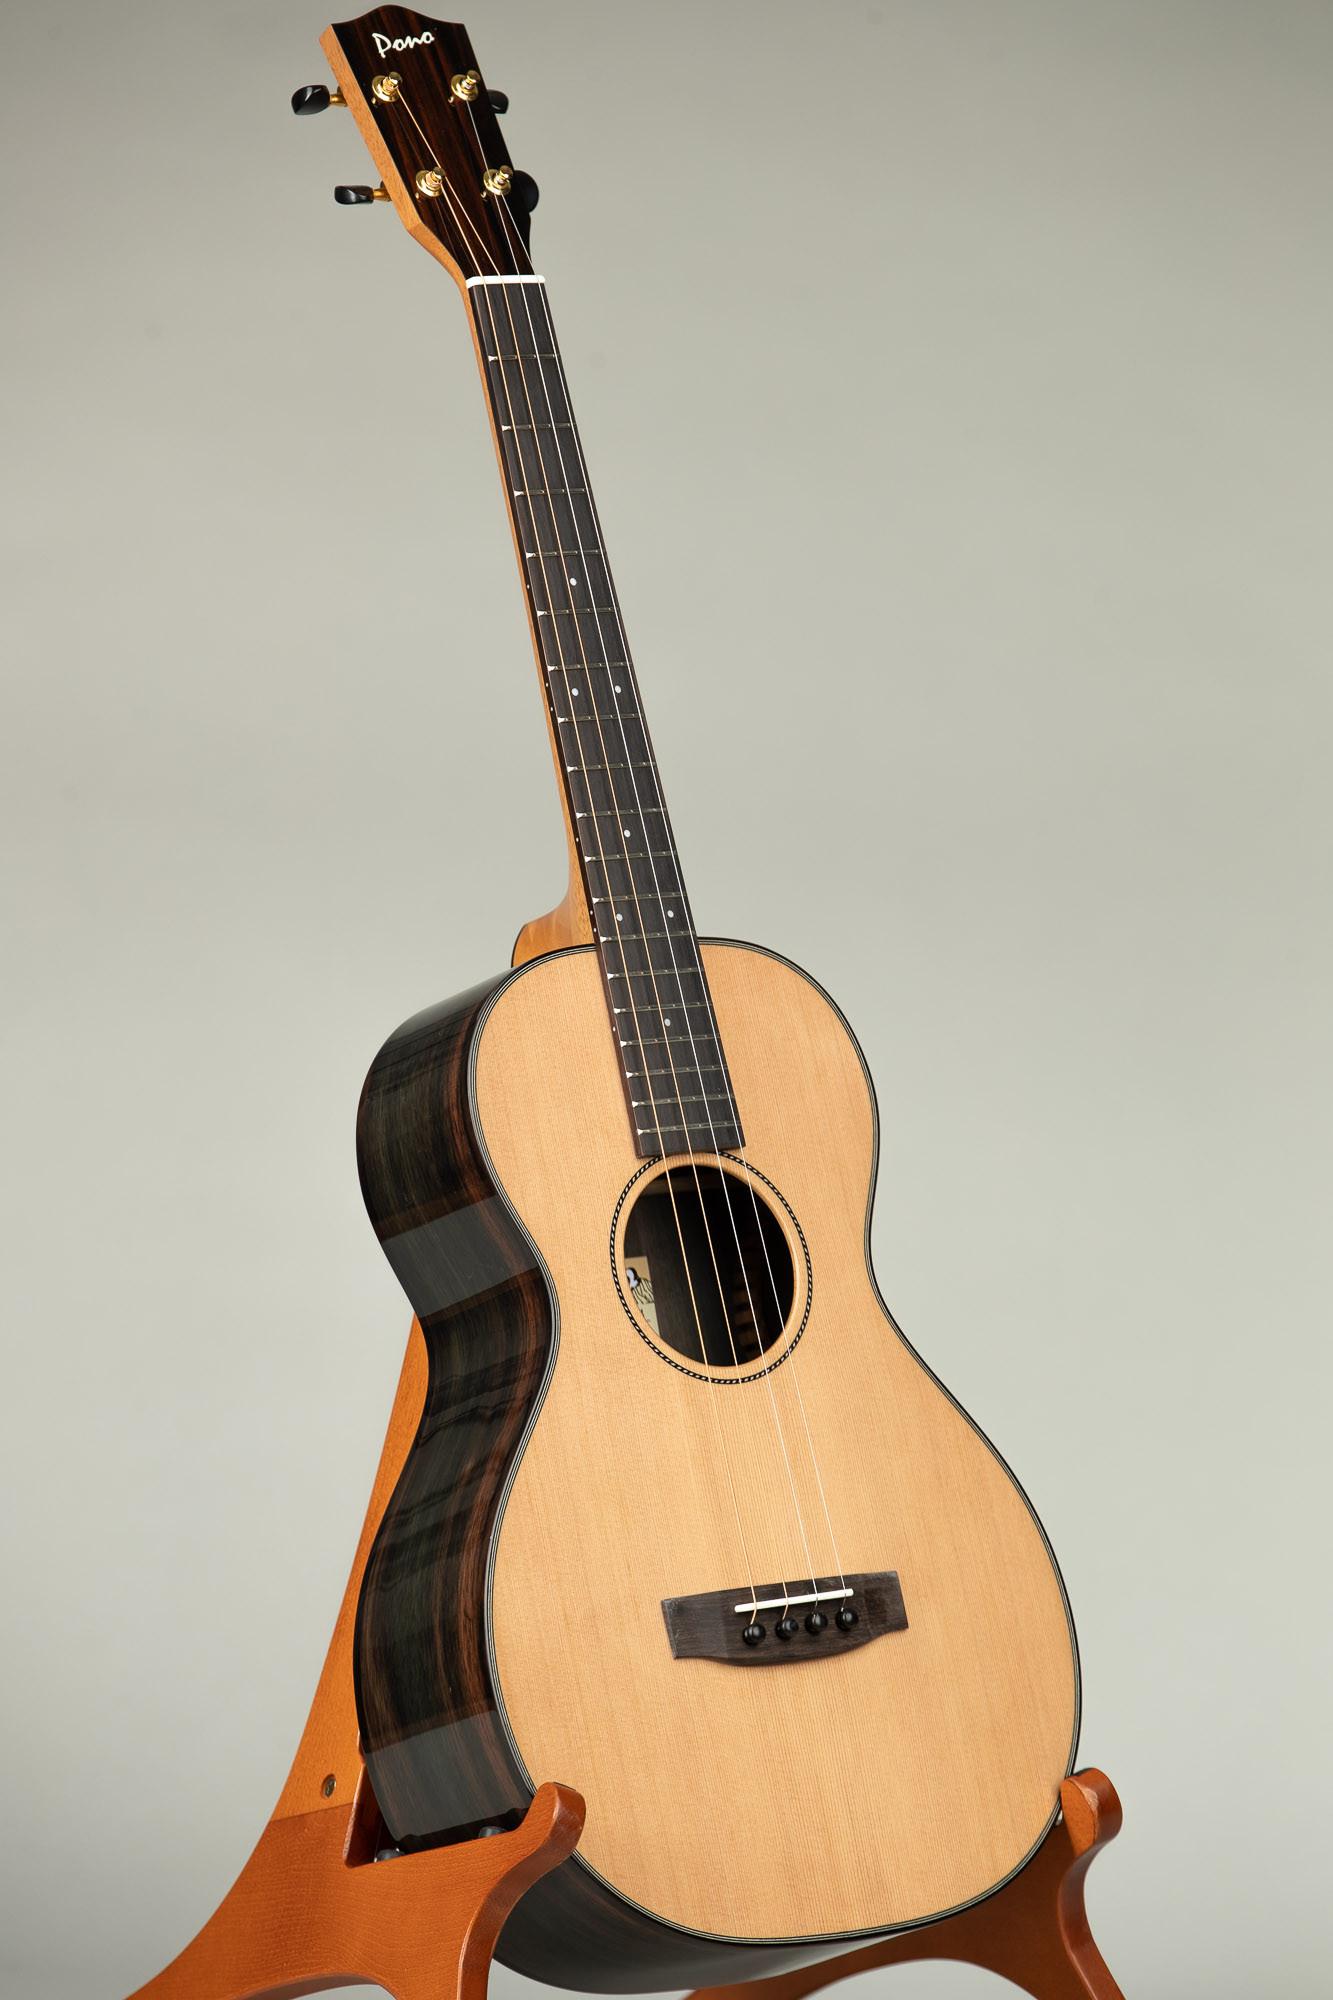 Pono Cedar Rosewood Steel String Baritone (UL4-4 3037)